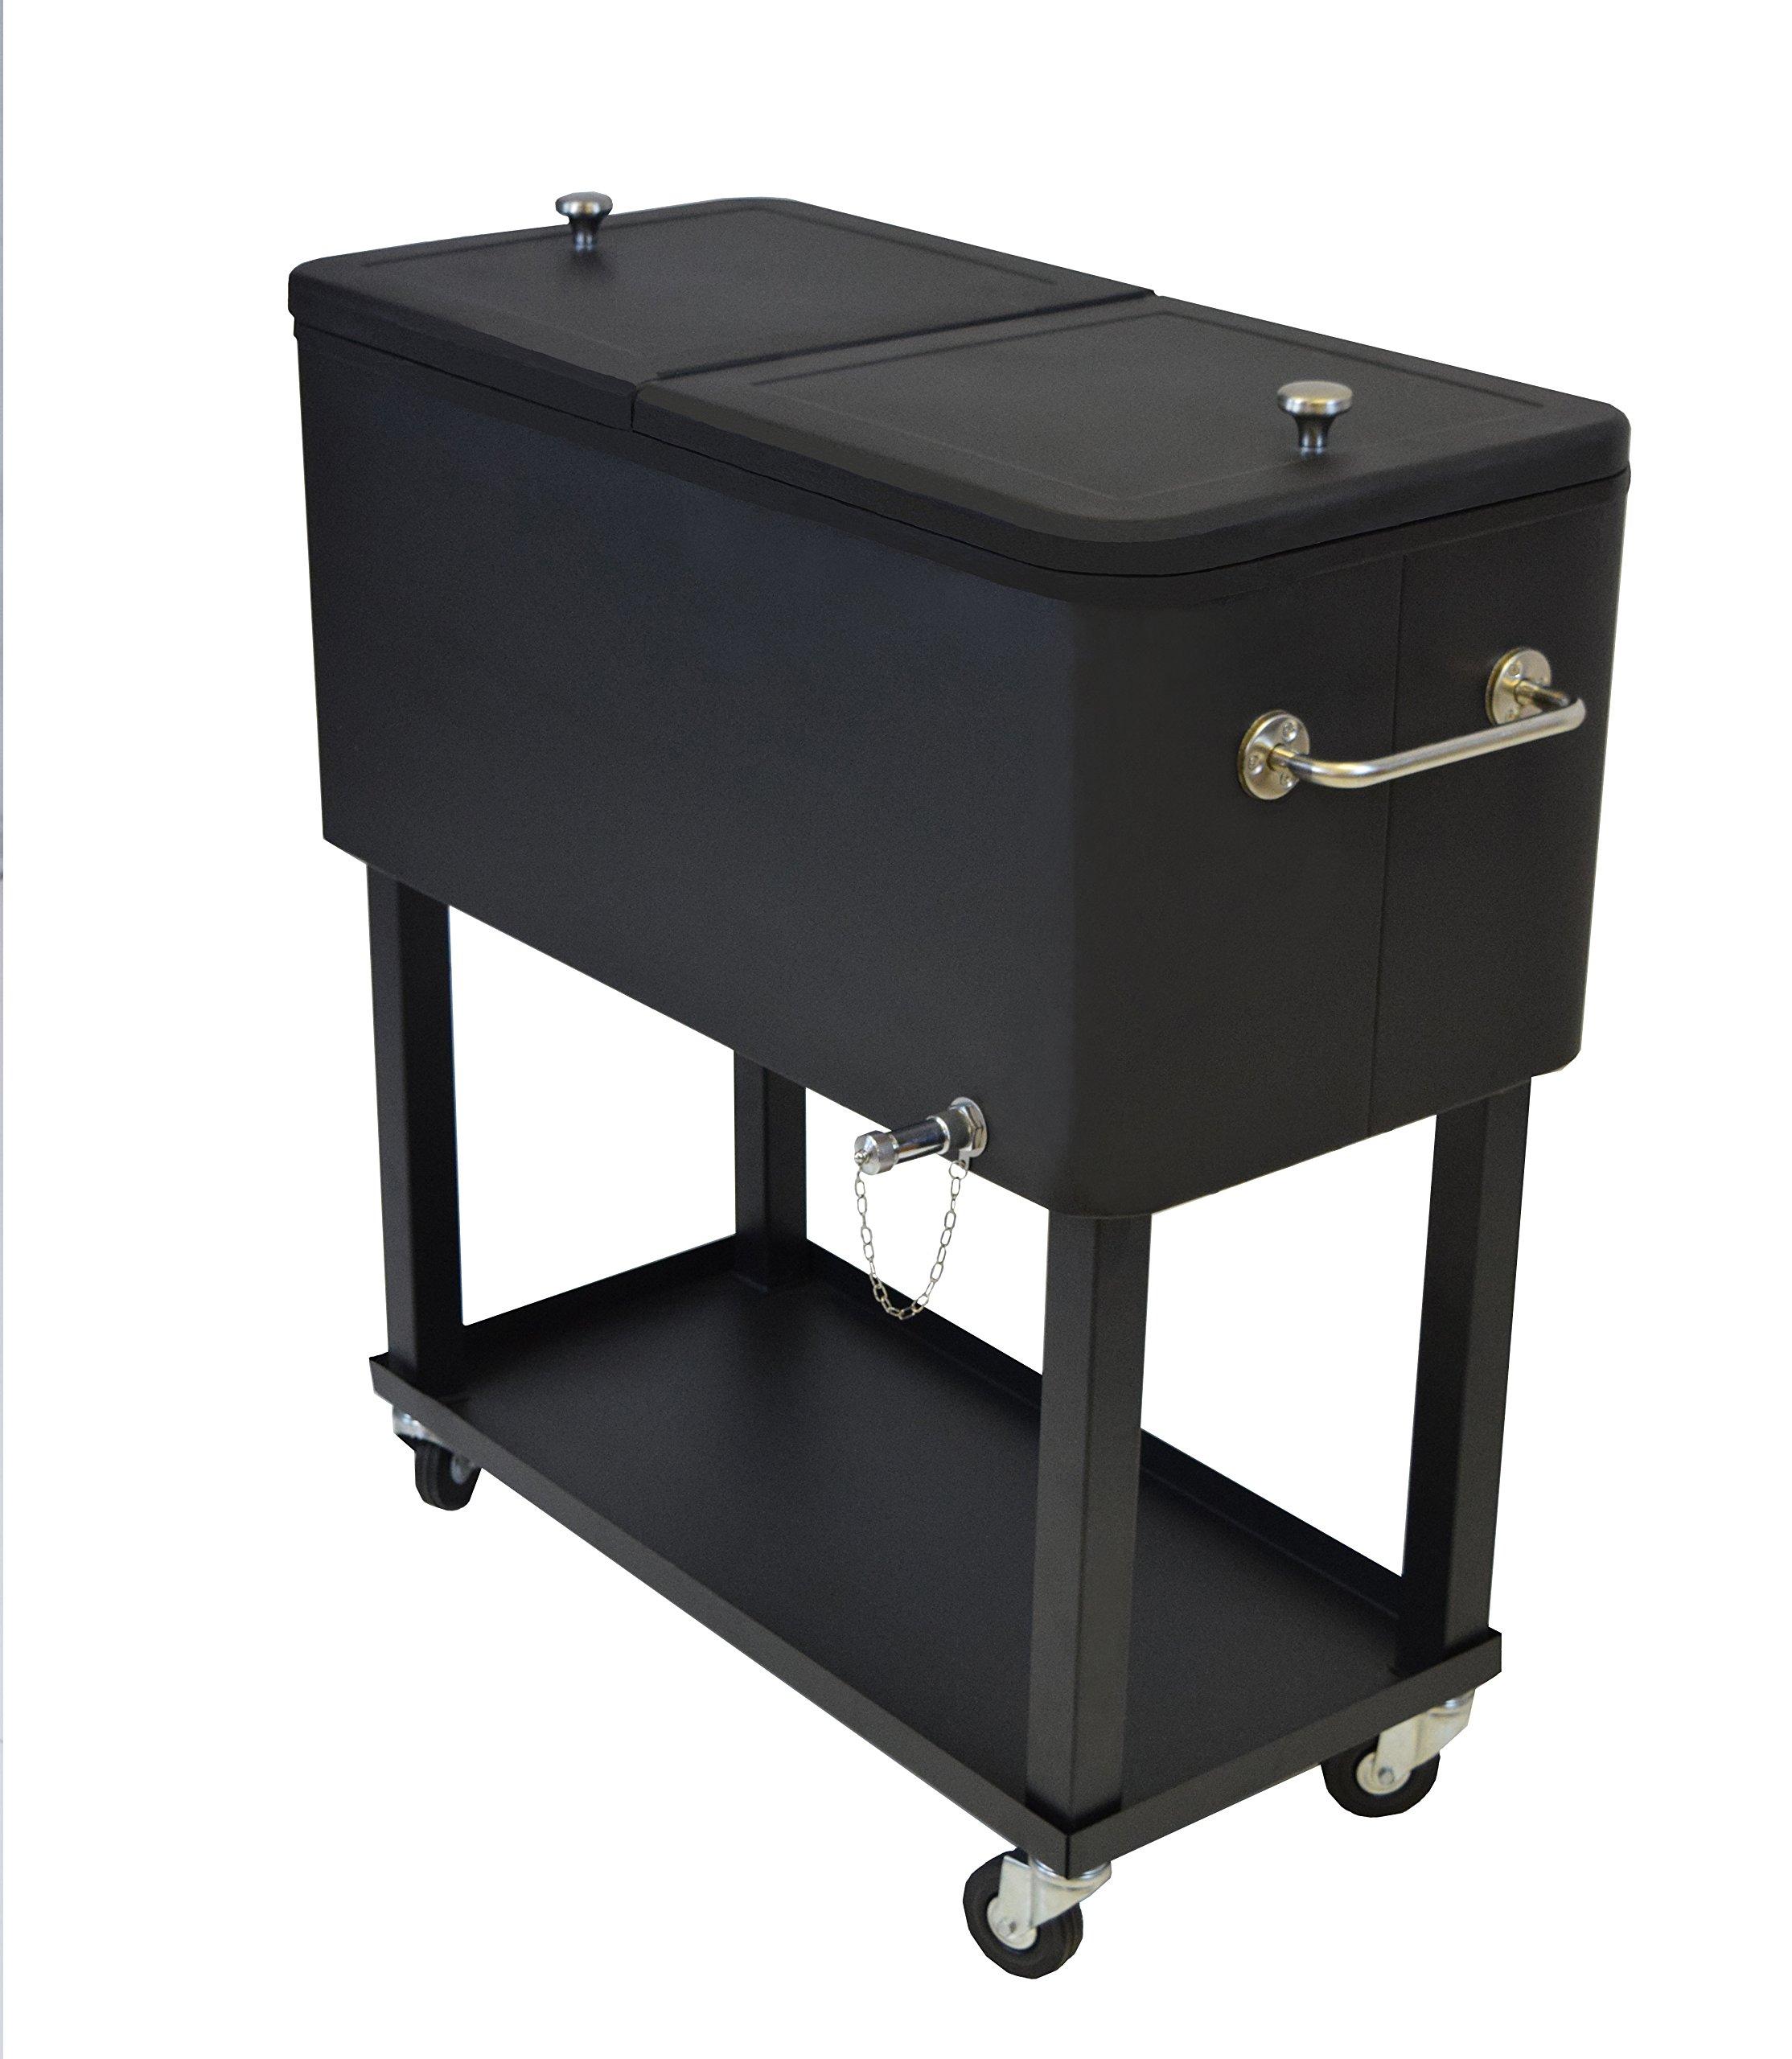 Oakland Living 90010-BK Steel Patio Cooler with Cart, 80-Quart